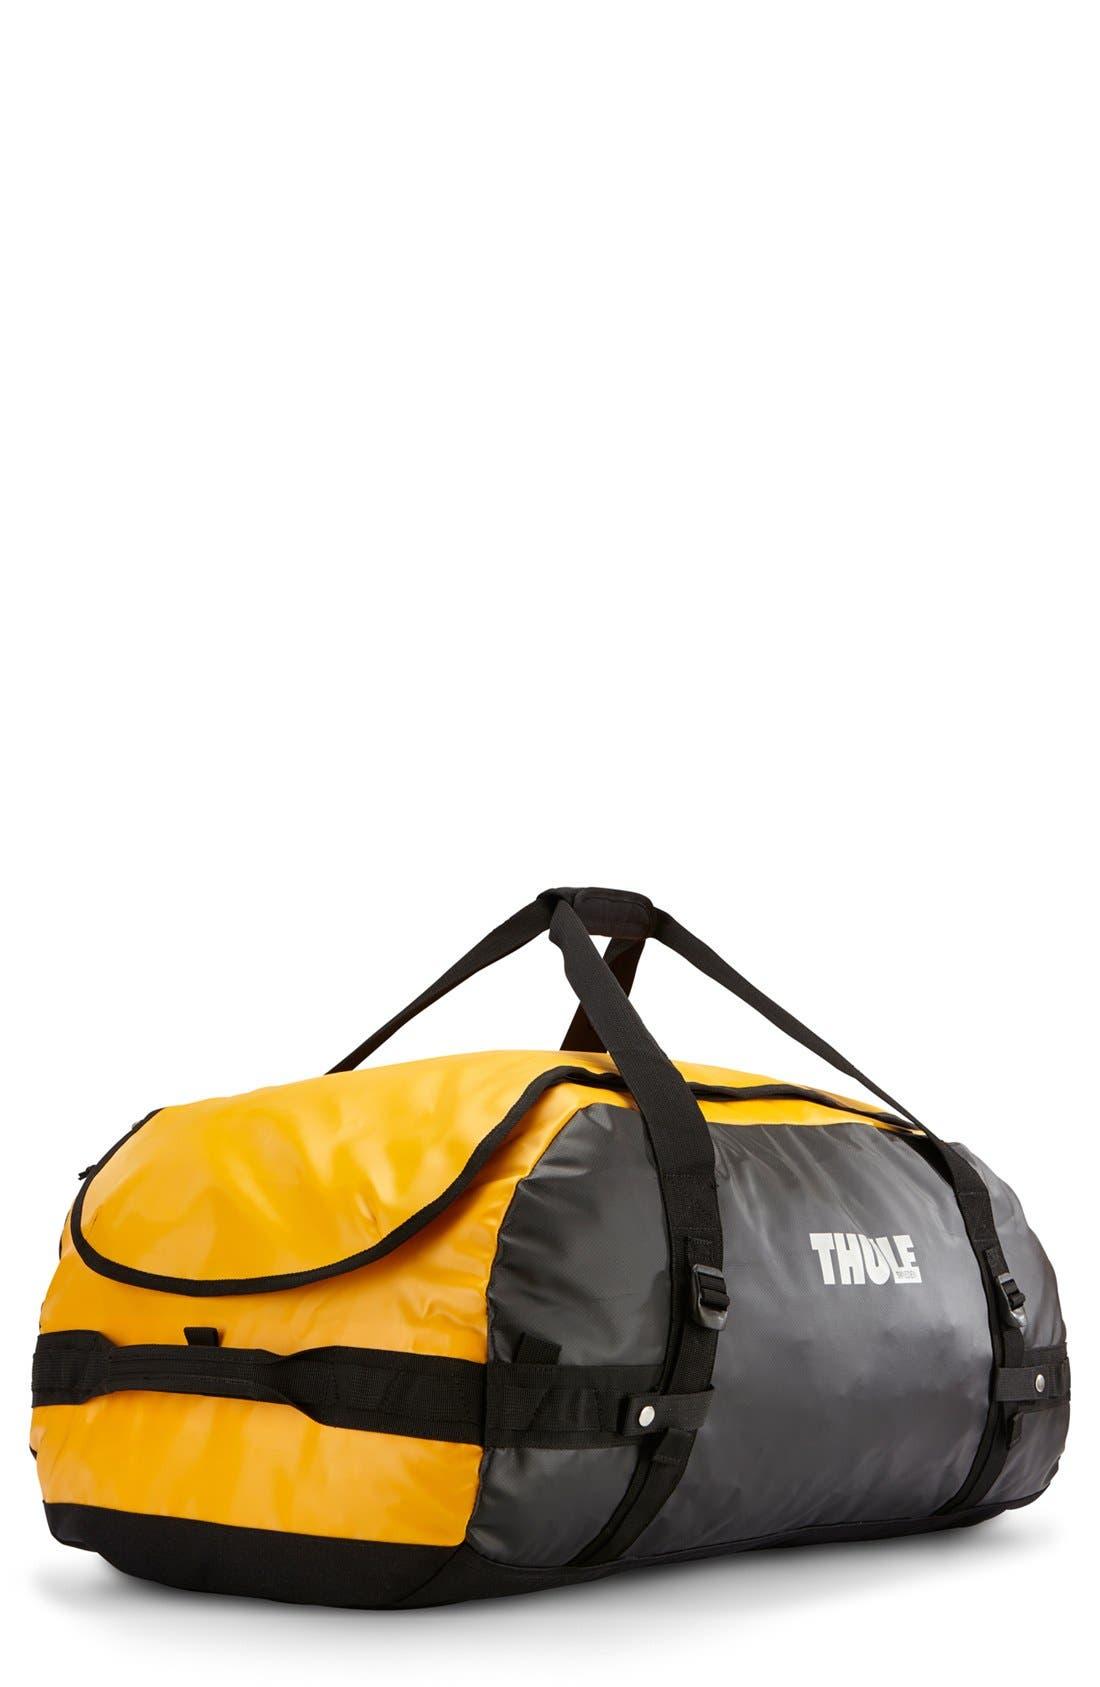 Main Image - Thule Large Duffel Bag (90L Capacity)